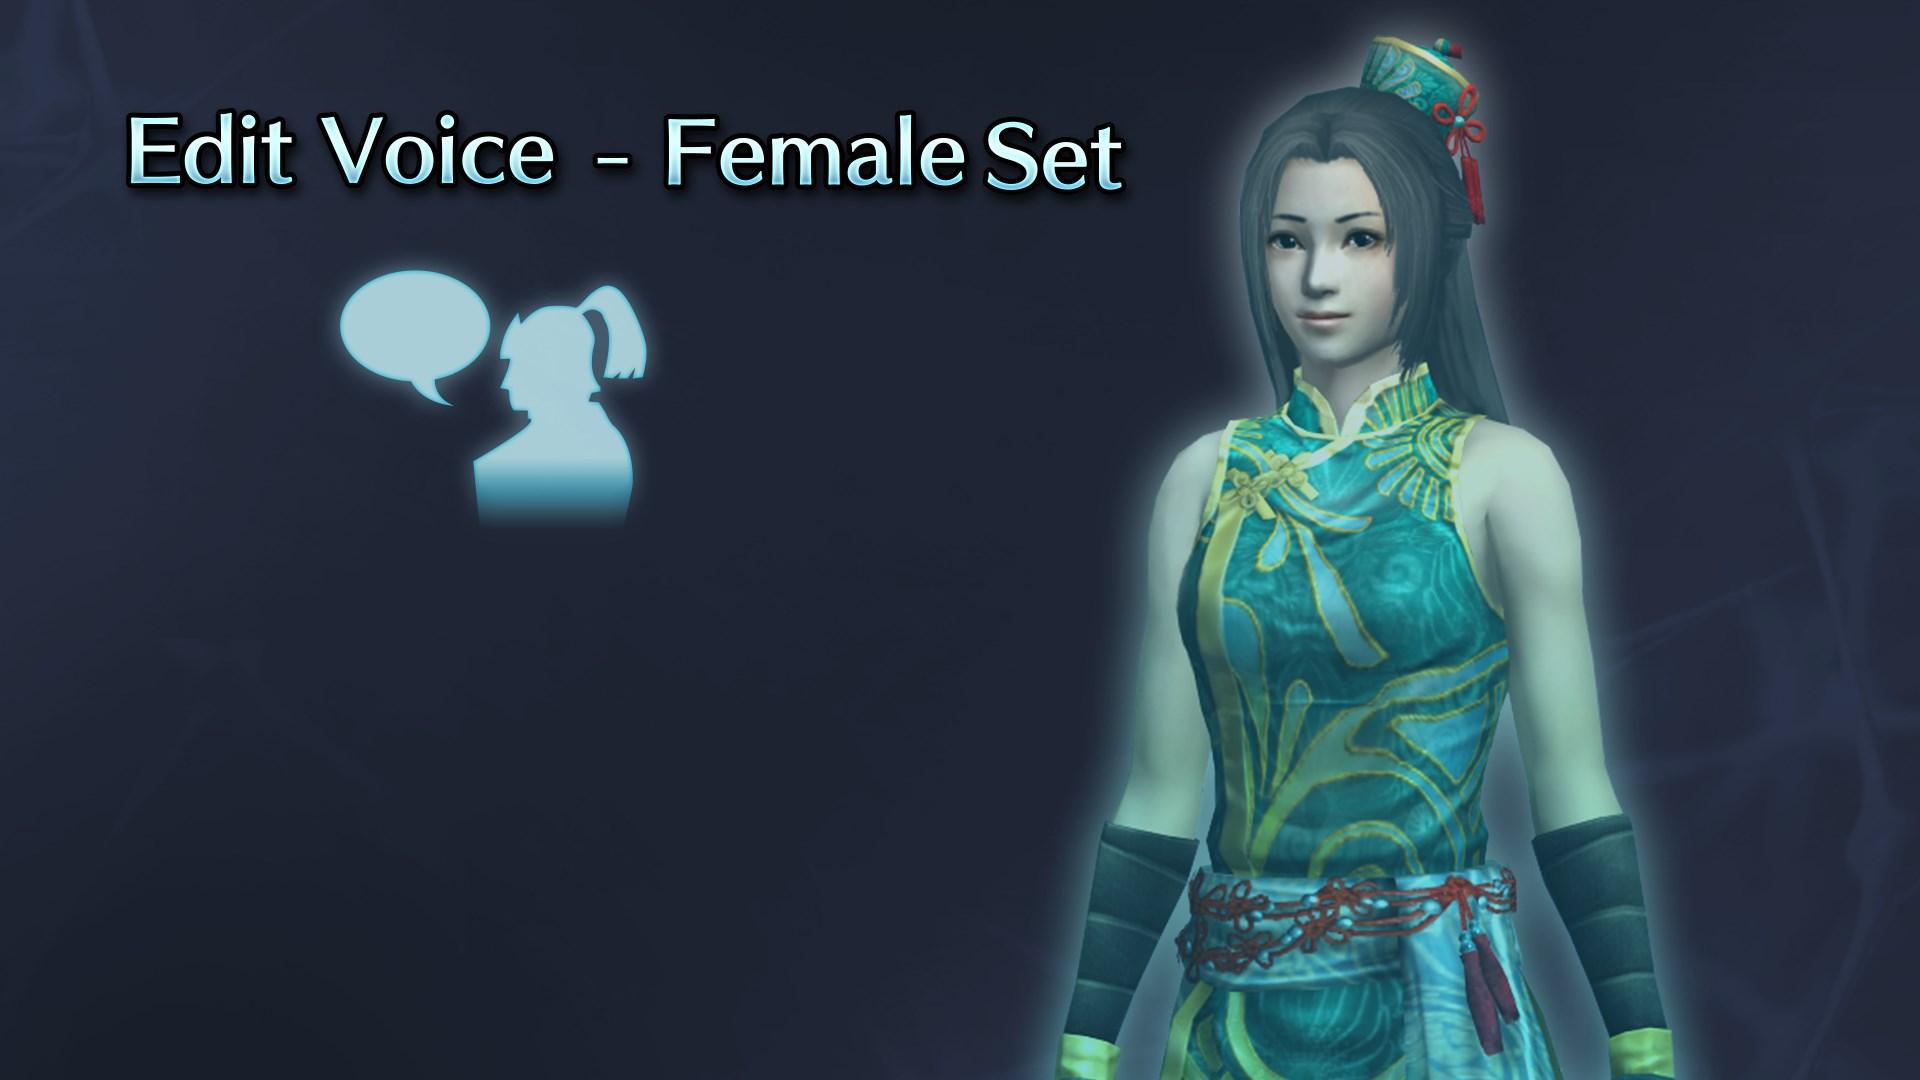 Edit Voice - Female Set